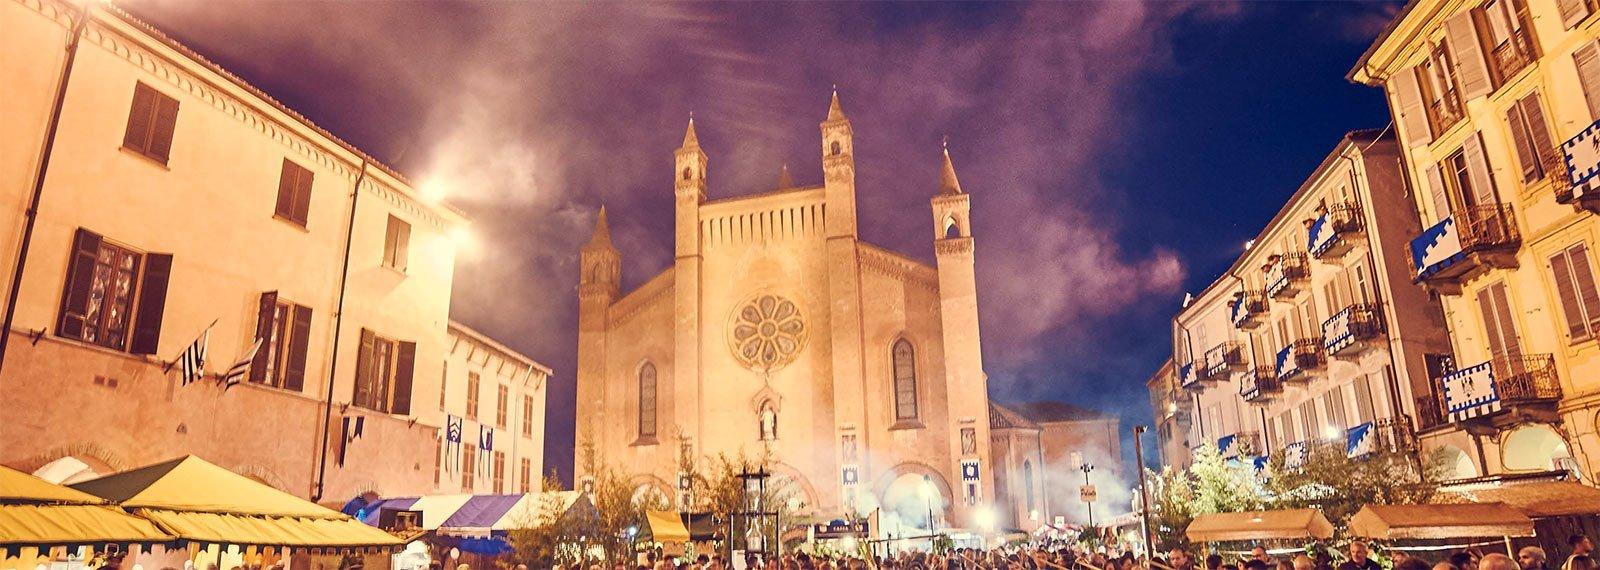 Alba ( Cuneo )